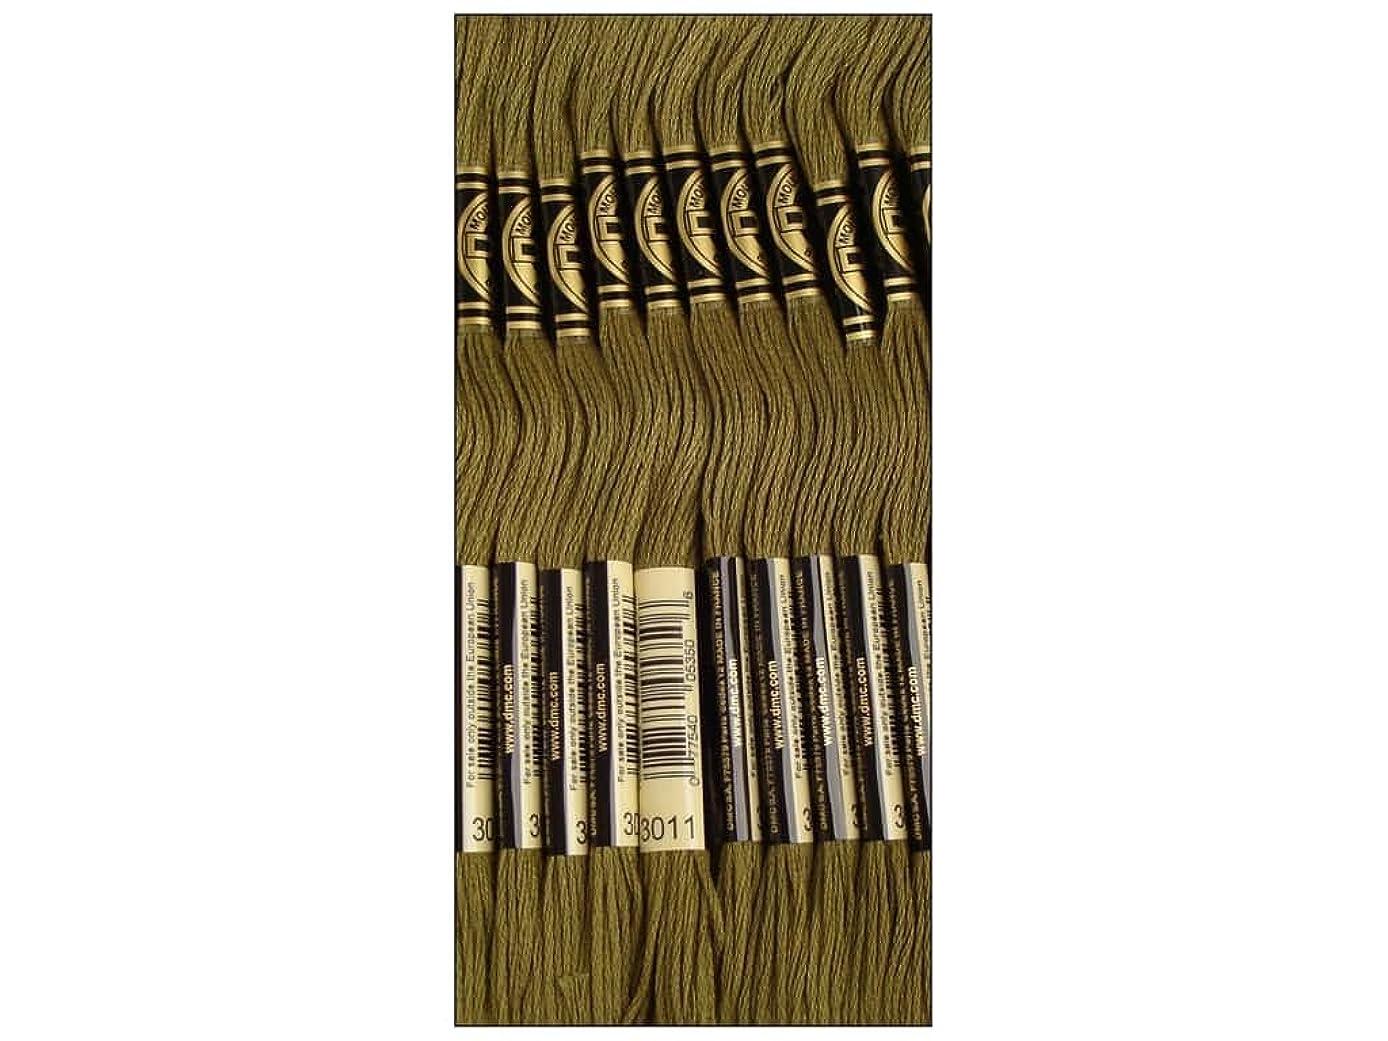 Bulk Buy: DMC Thread Six Strand Embroidery Cotton 8.7 Yards Dark Khaki Green 117-3011 (12-Pack)